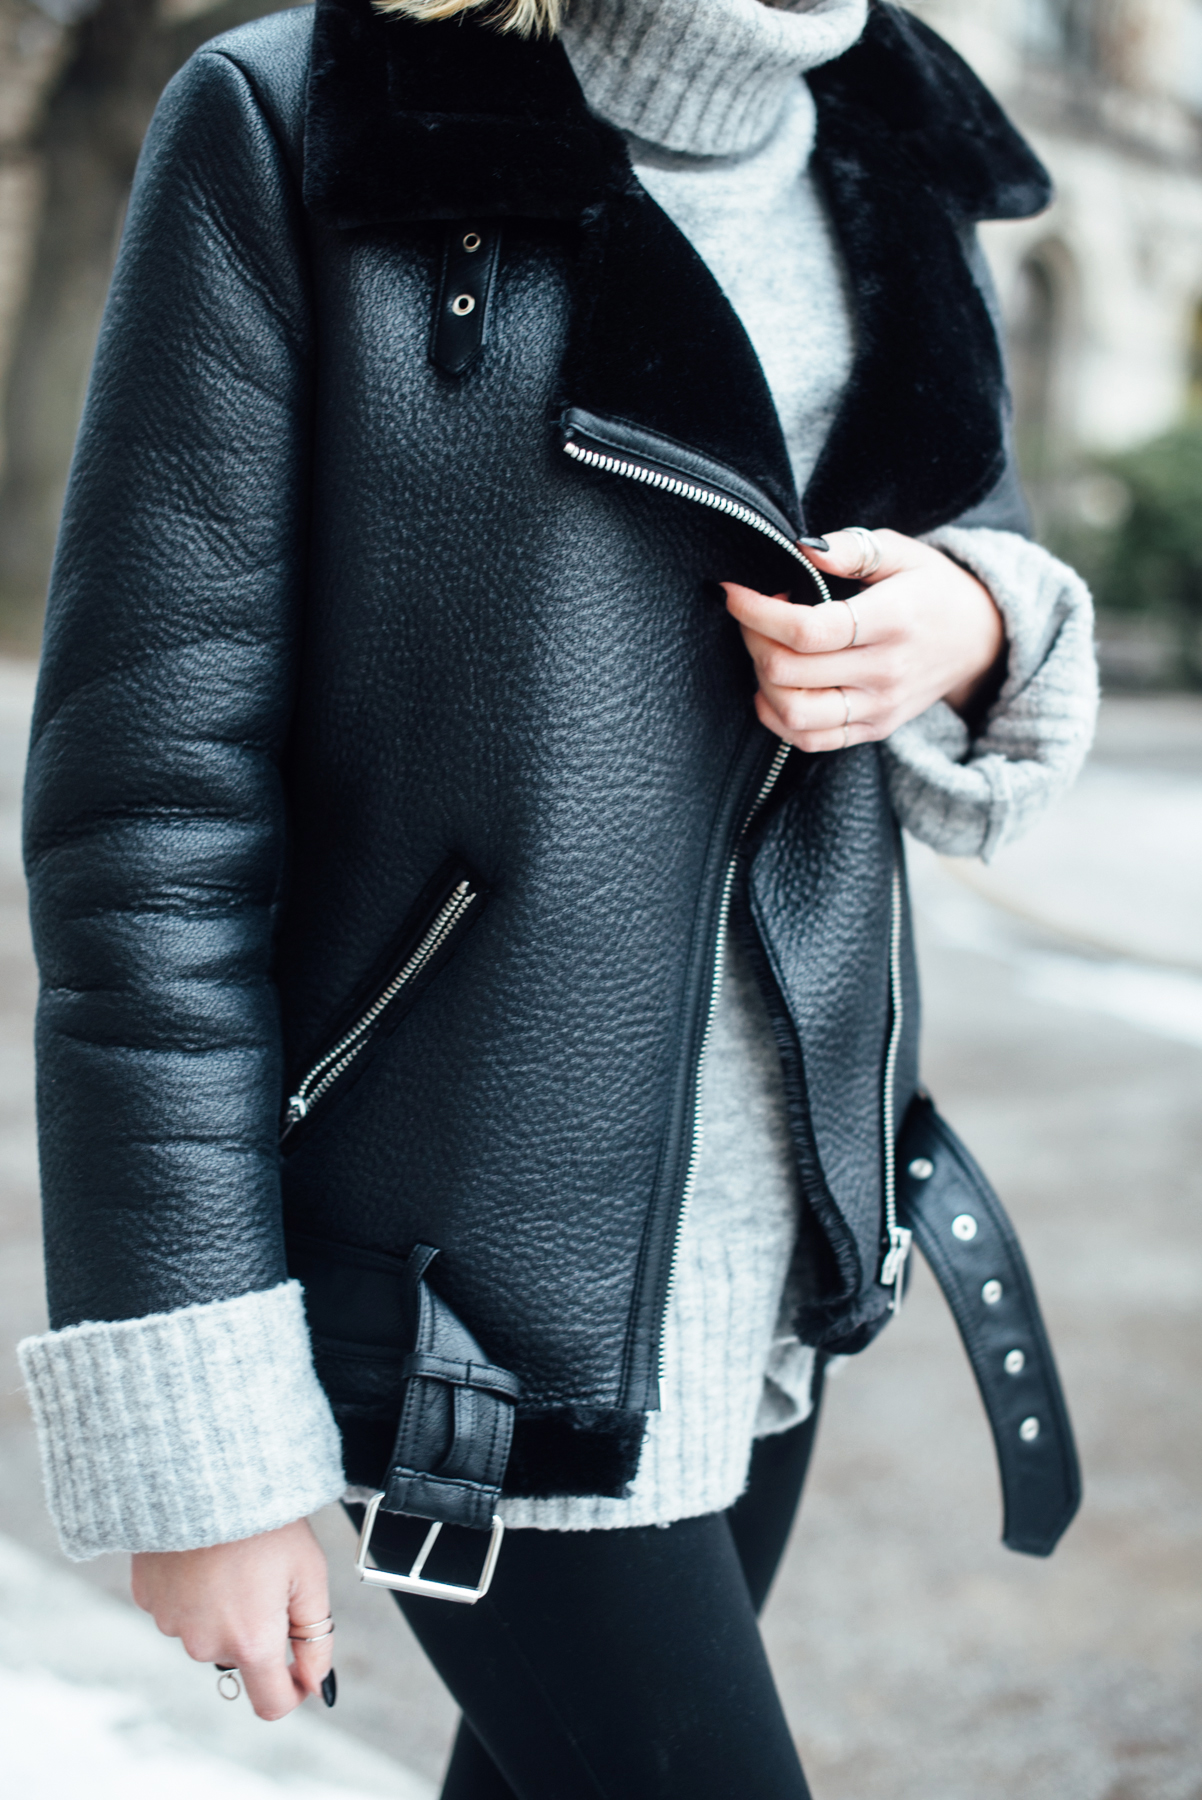 04-Kiamisu-Modeblog-Fashion Week Berlin_Shearling Jacke-8